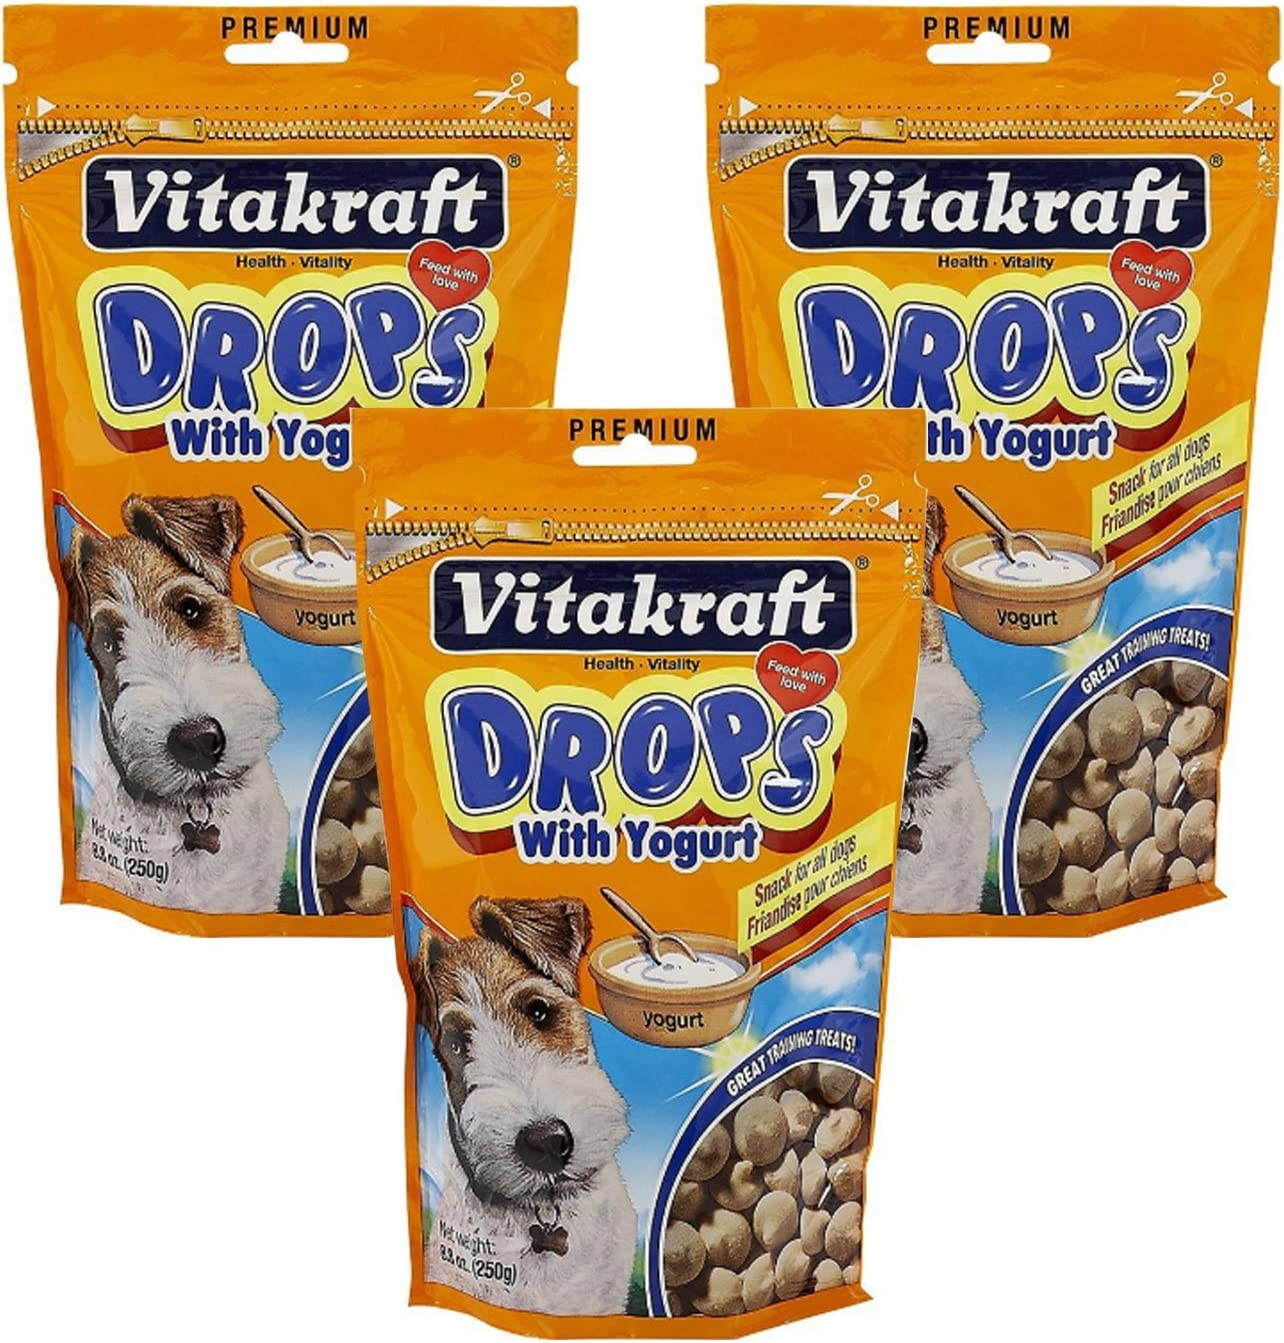 VitaKraft Drops with Yogurt Dog Treat Snacks - 3 PACK